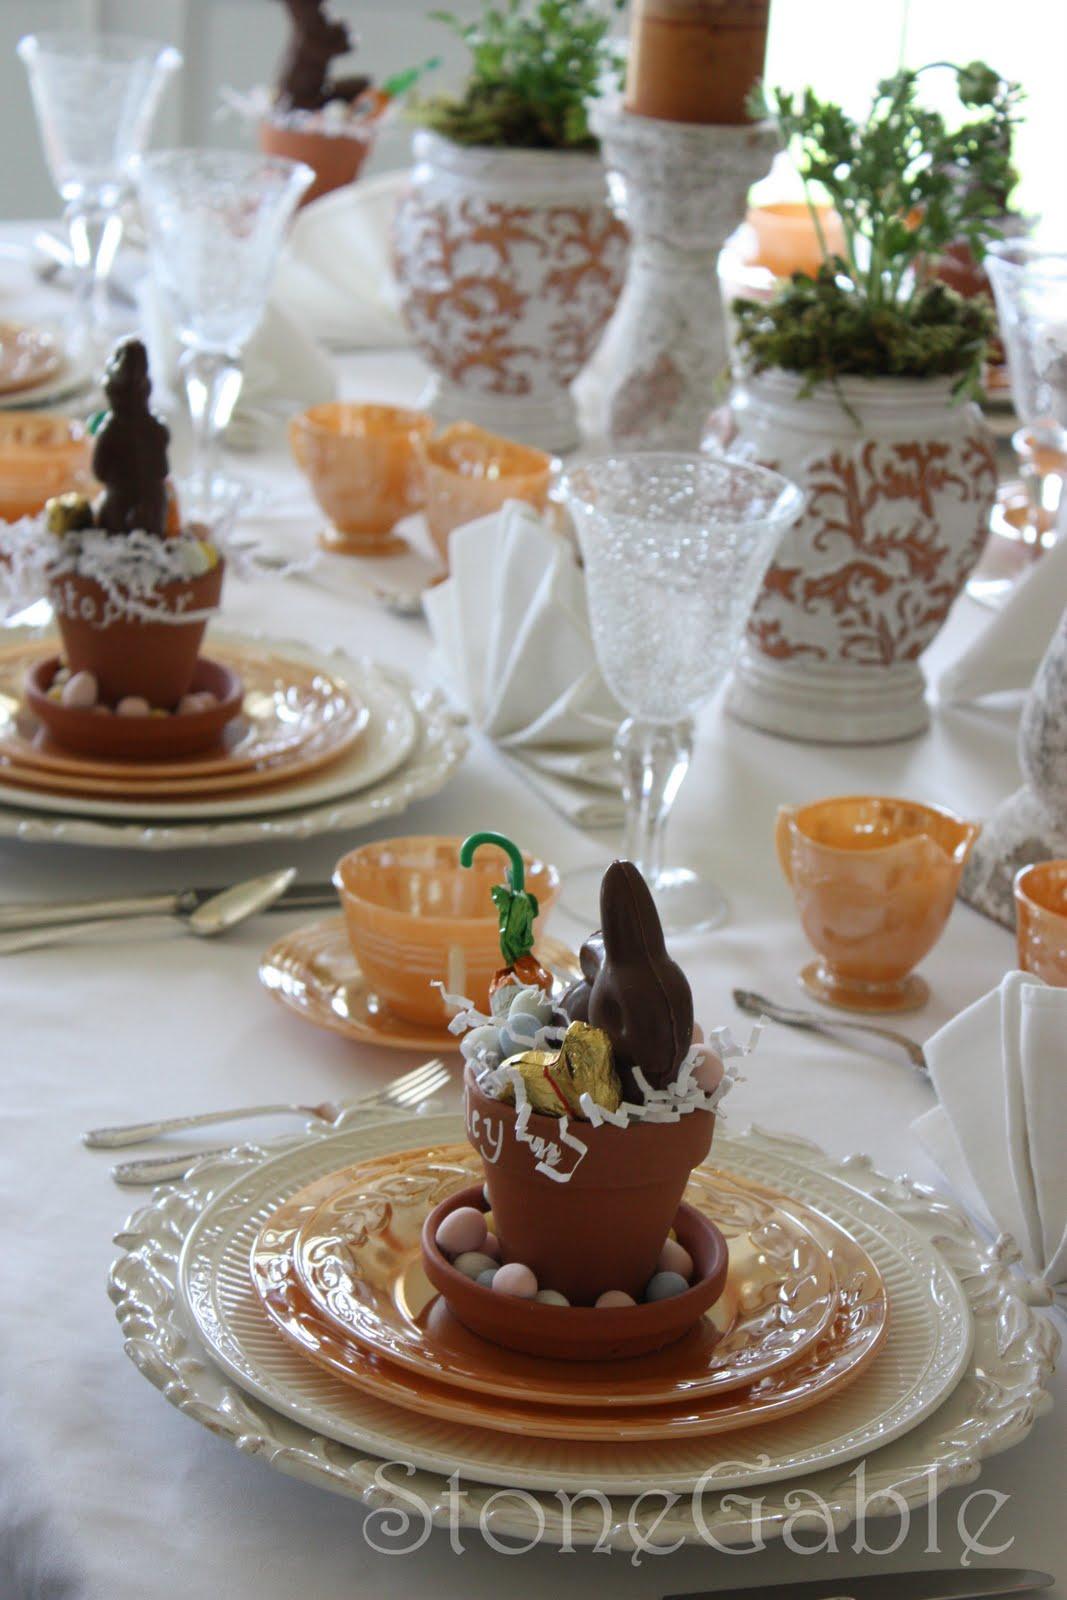 Easter Dinner Party Ideas Part - 42: StoneGable